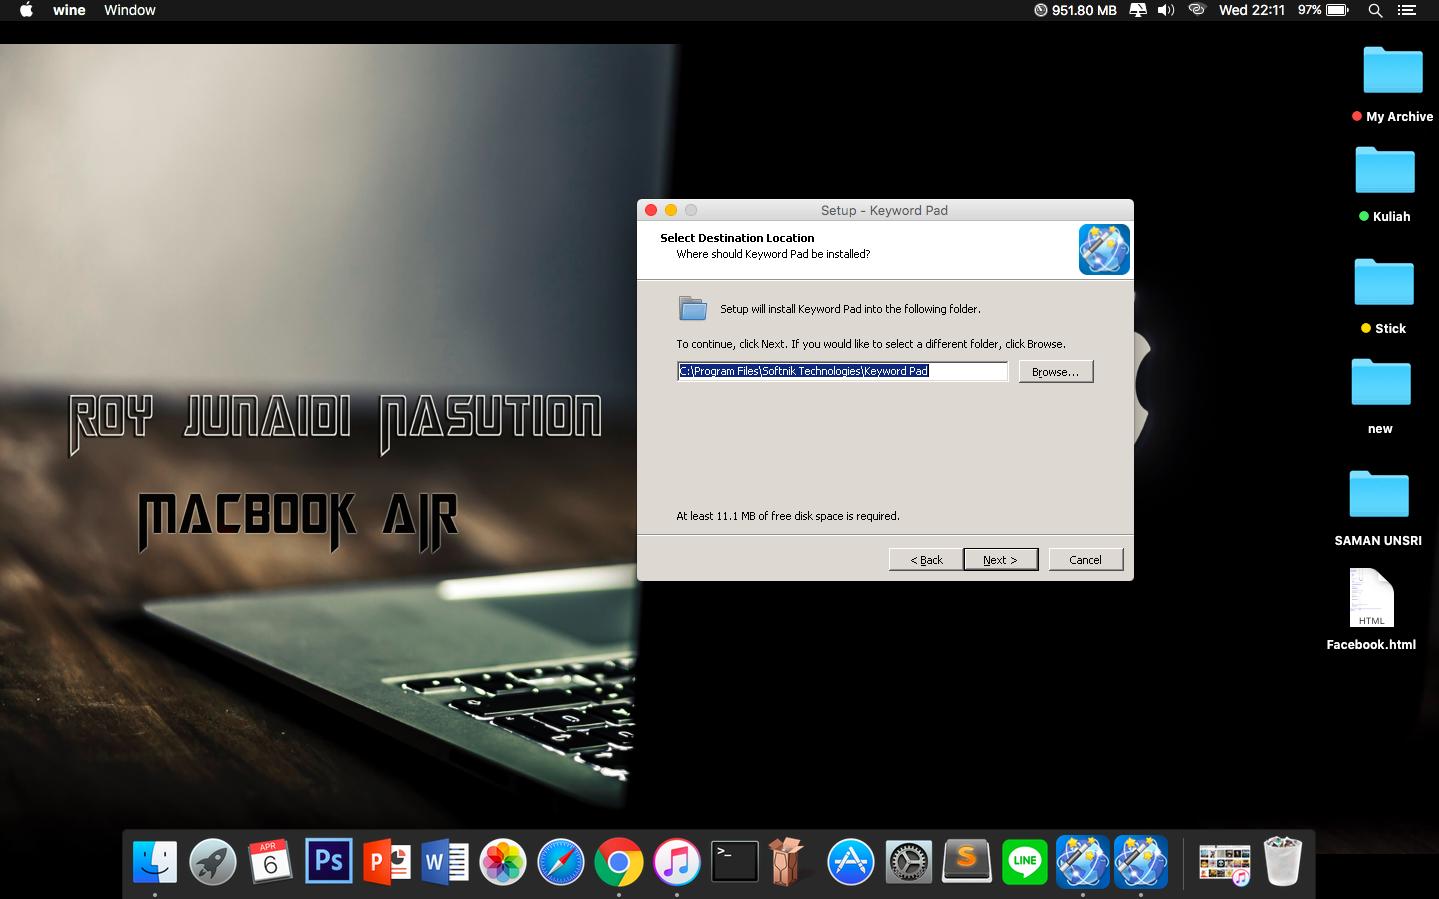 Recuva - Free Download - Download CCleaner, Recuva ...